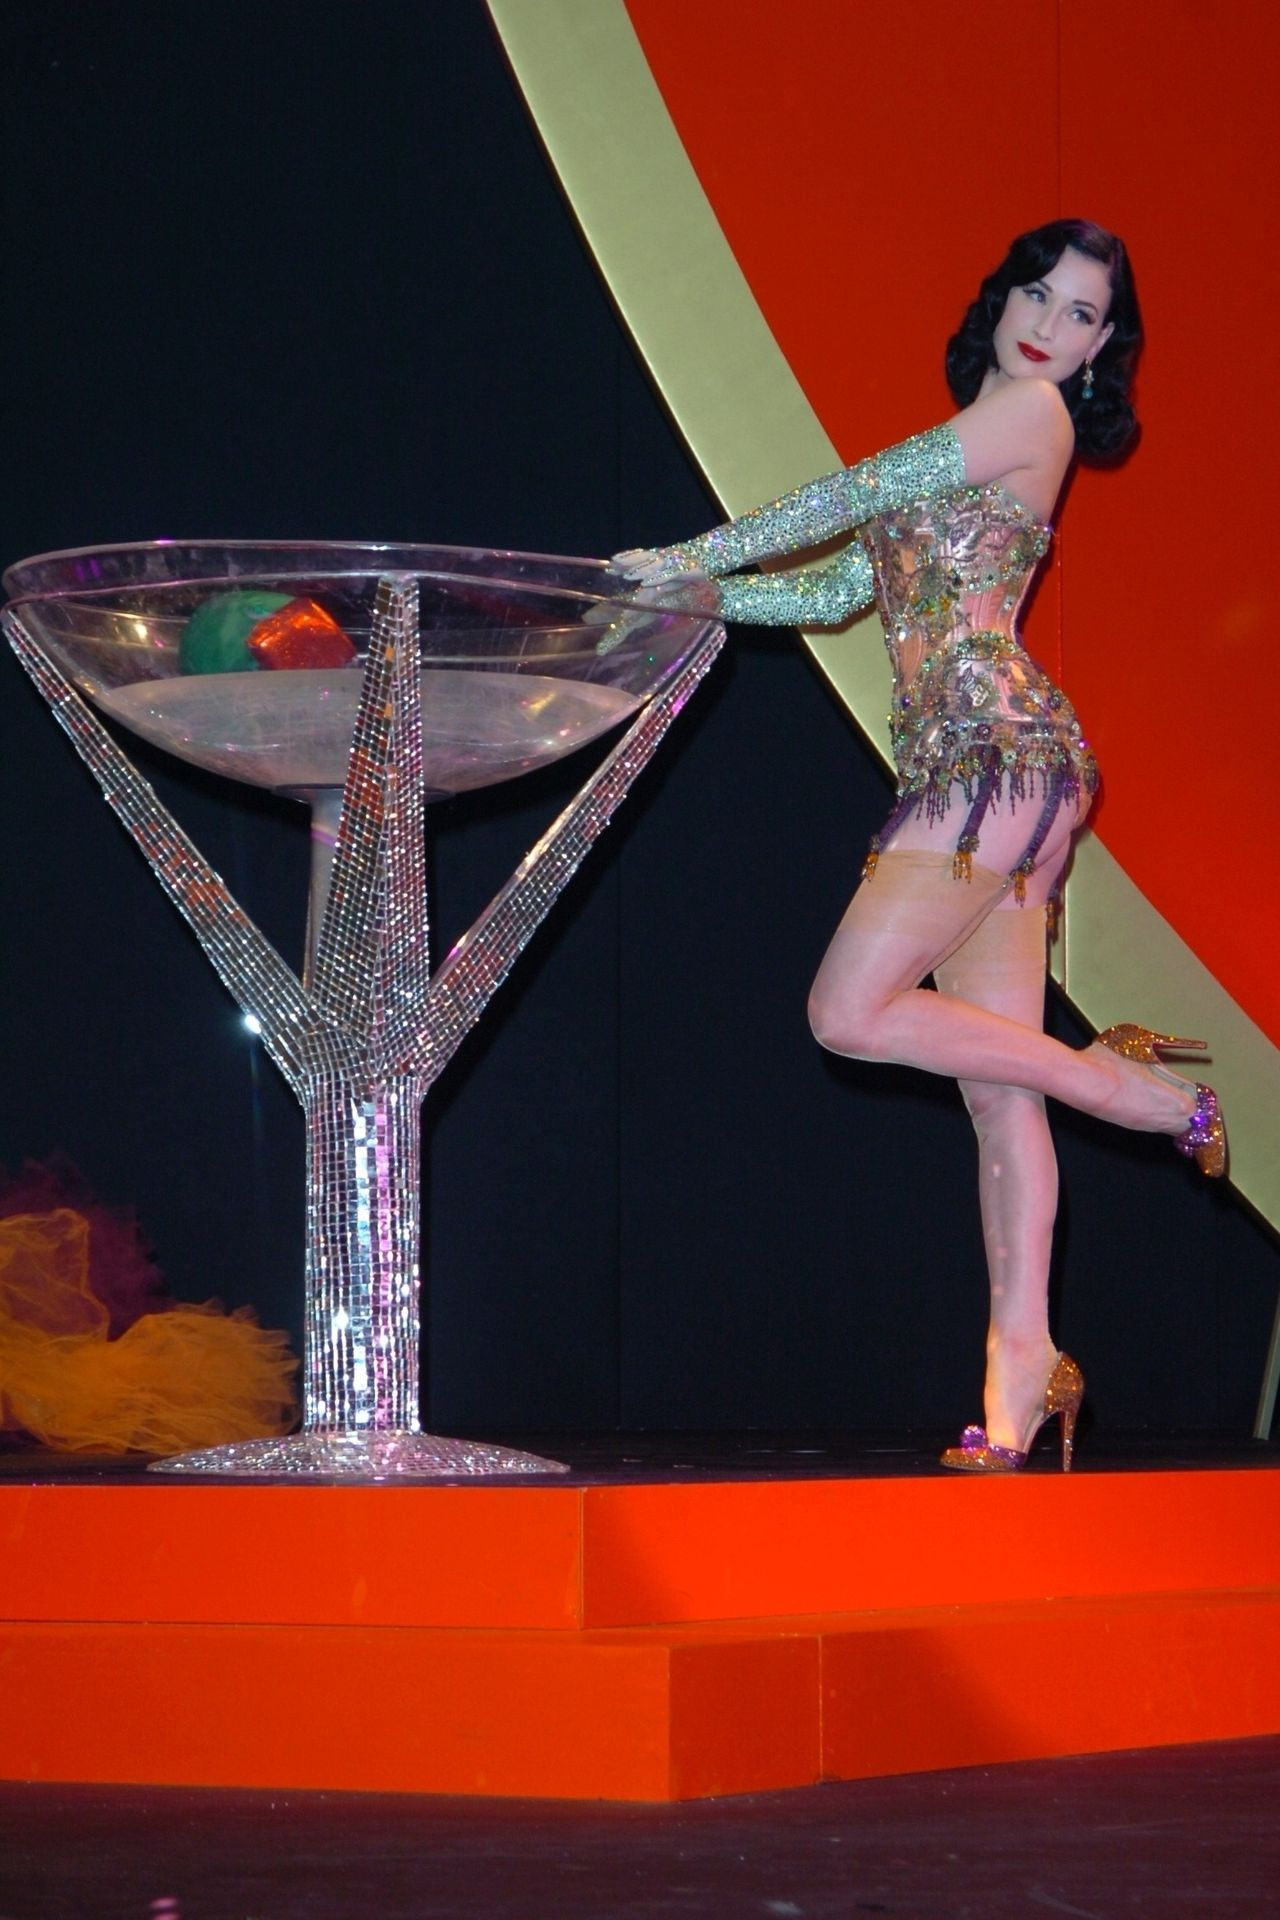 Dita Von Teese Performs At Erotica 06 In London 0015